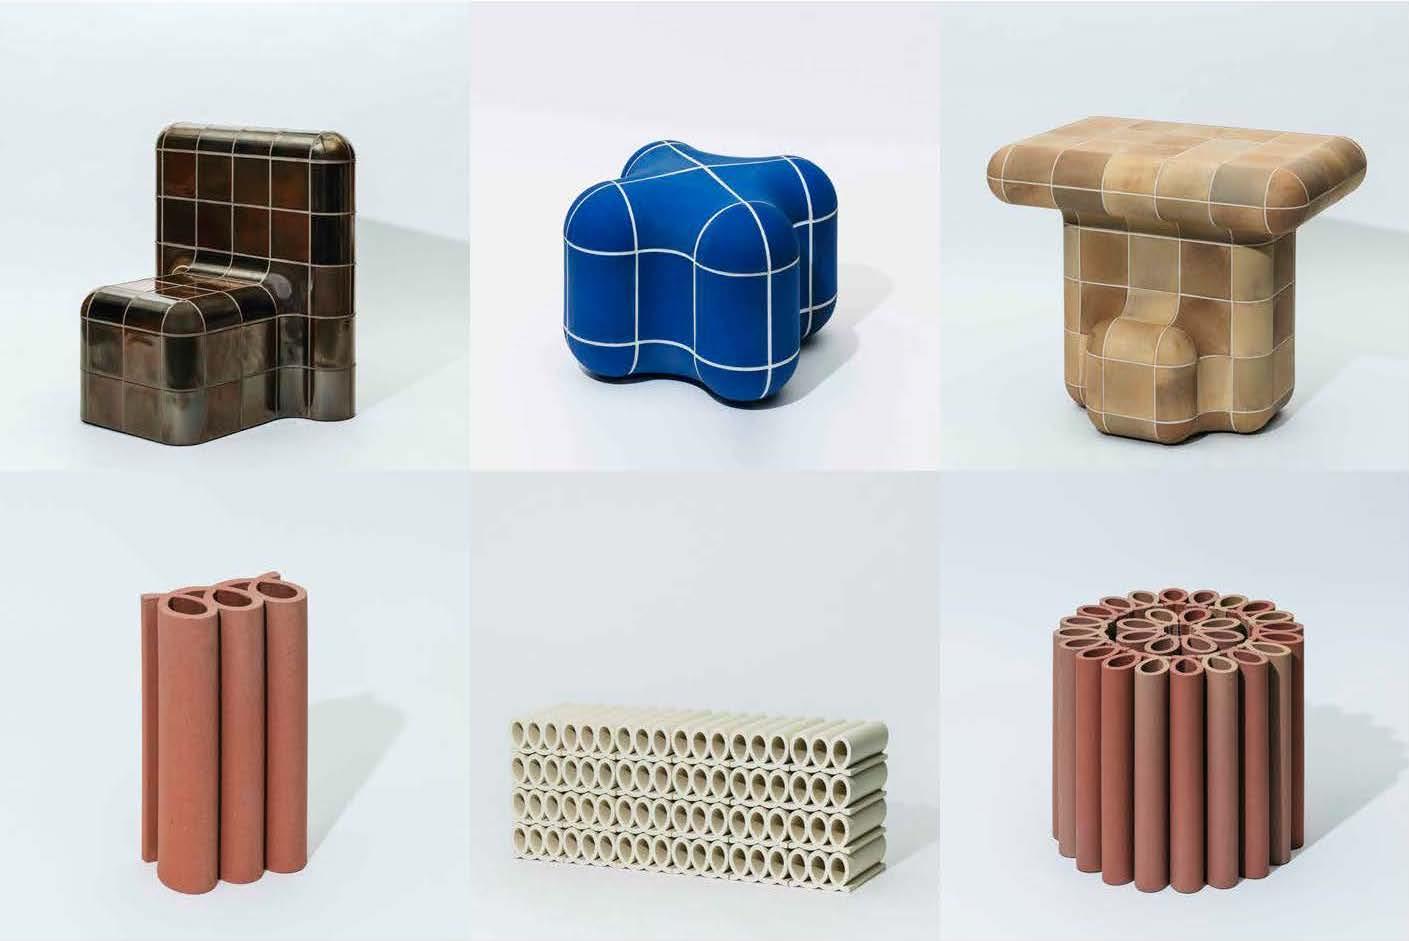 TAJIMI CUSTOM TILES TOKYO 2020 Installation by Max Lamb and Kwangho Lee